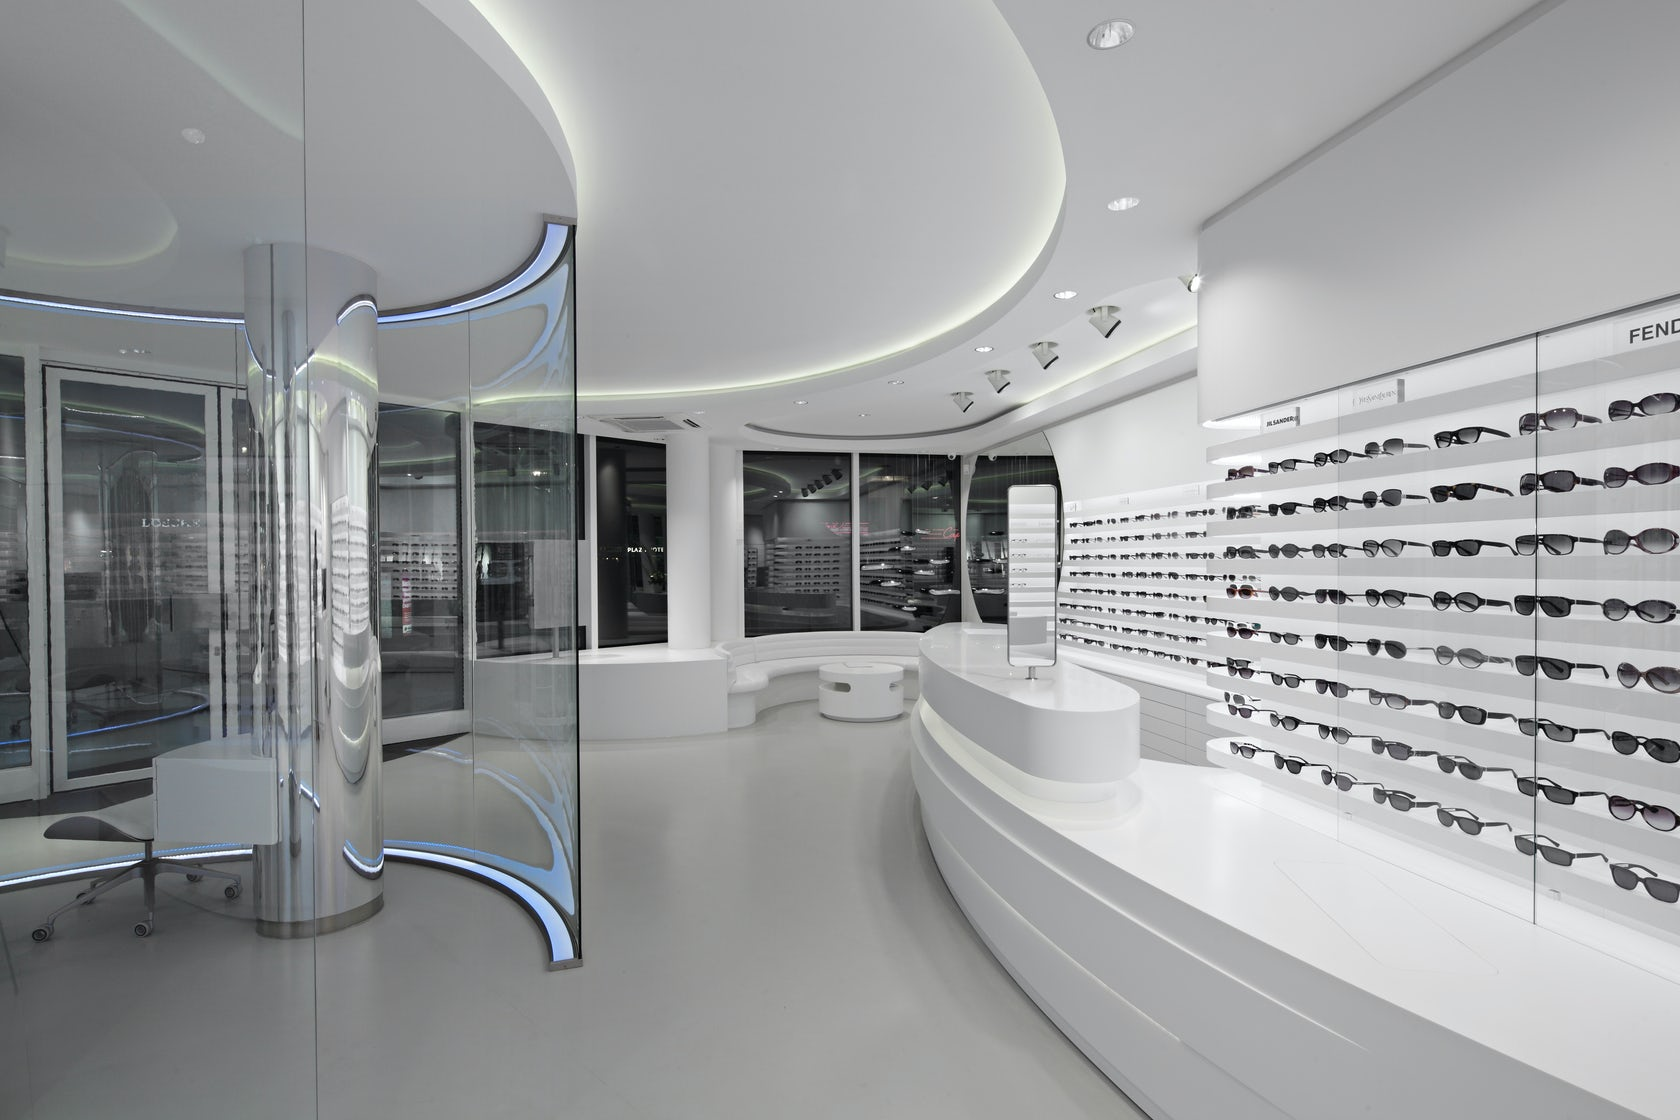 zeiss vision store berlin architizer. Black Bedroom Furniture Sets. Home Design Ideas